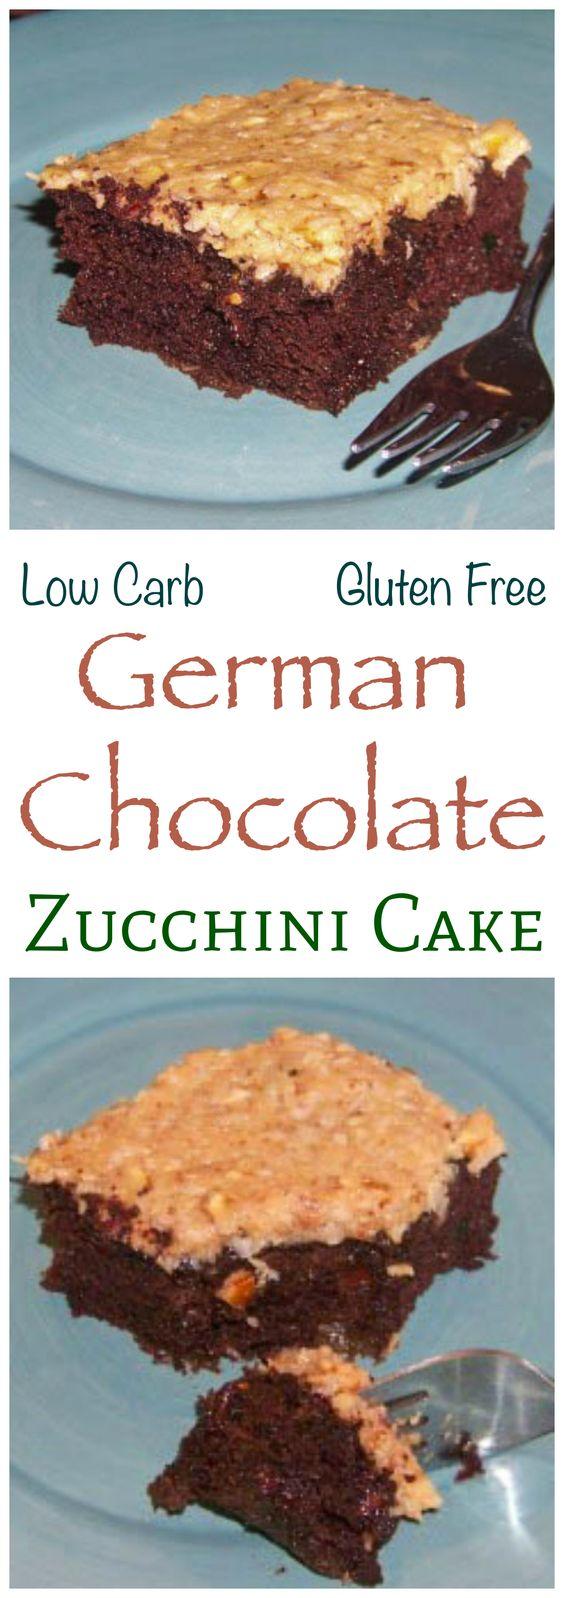 Low Carb German Chocolate Cake Bars